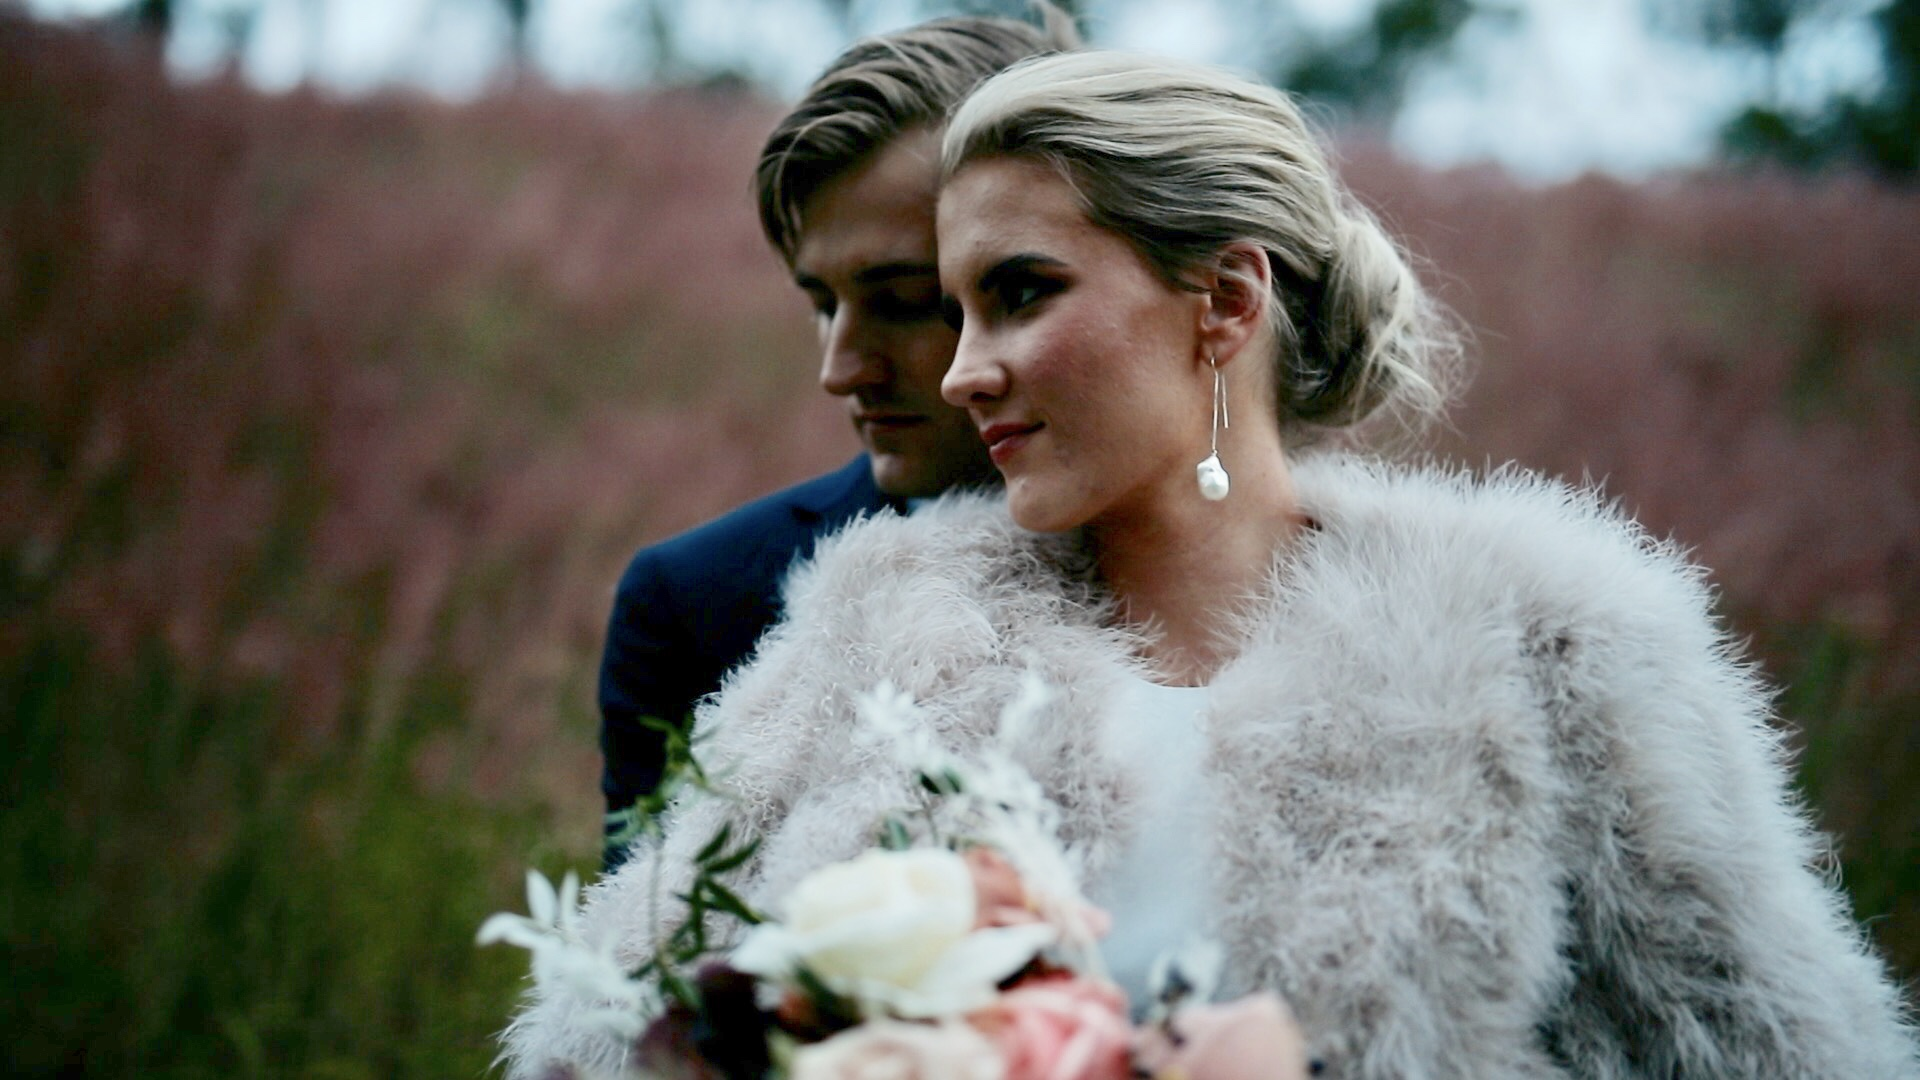 Nicholas + Adeline | Mount Cotton, Australia | Rainforest Gardens